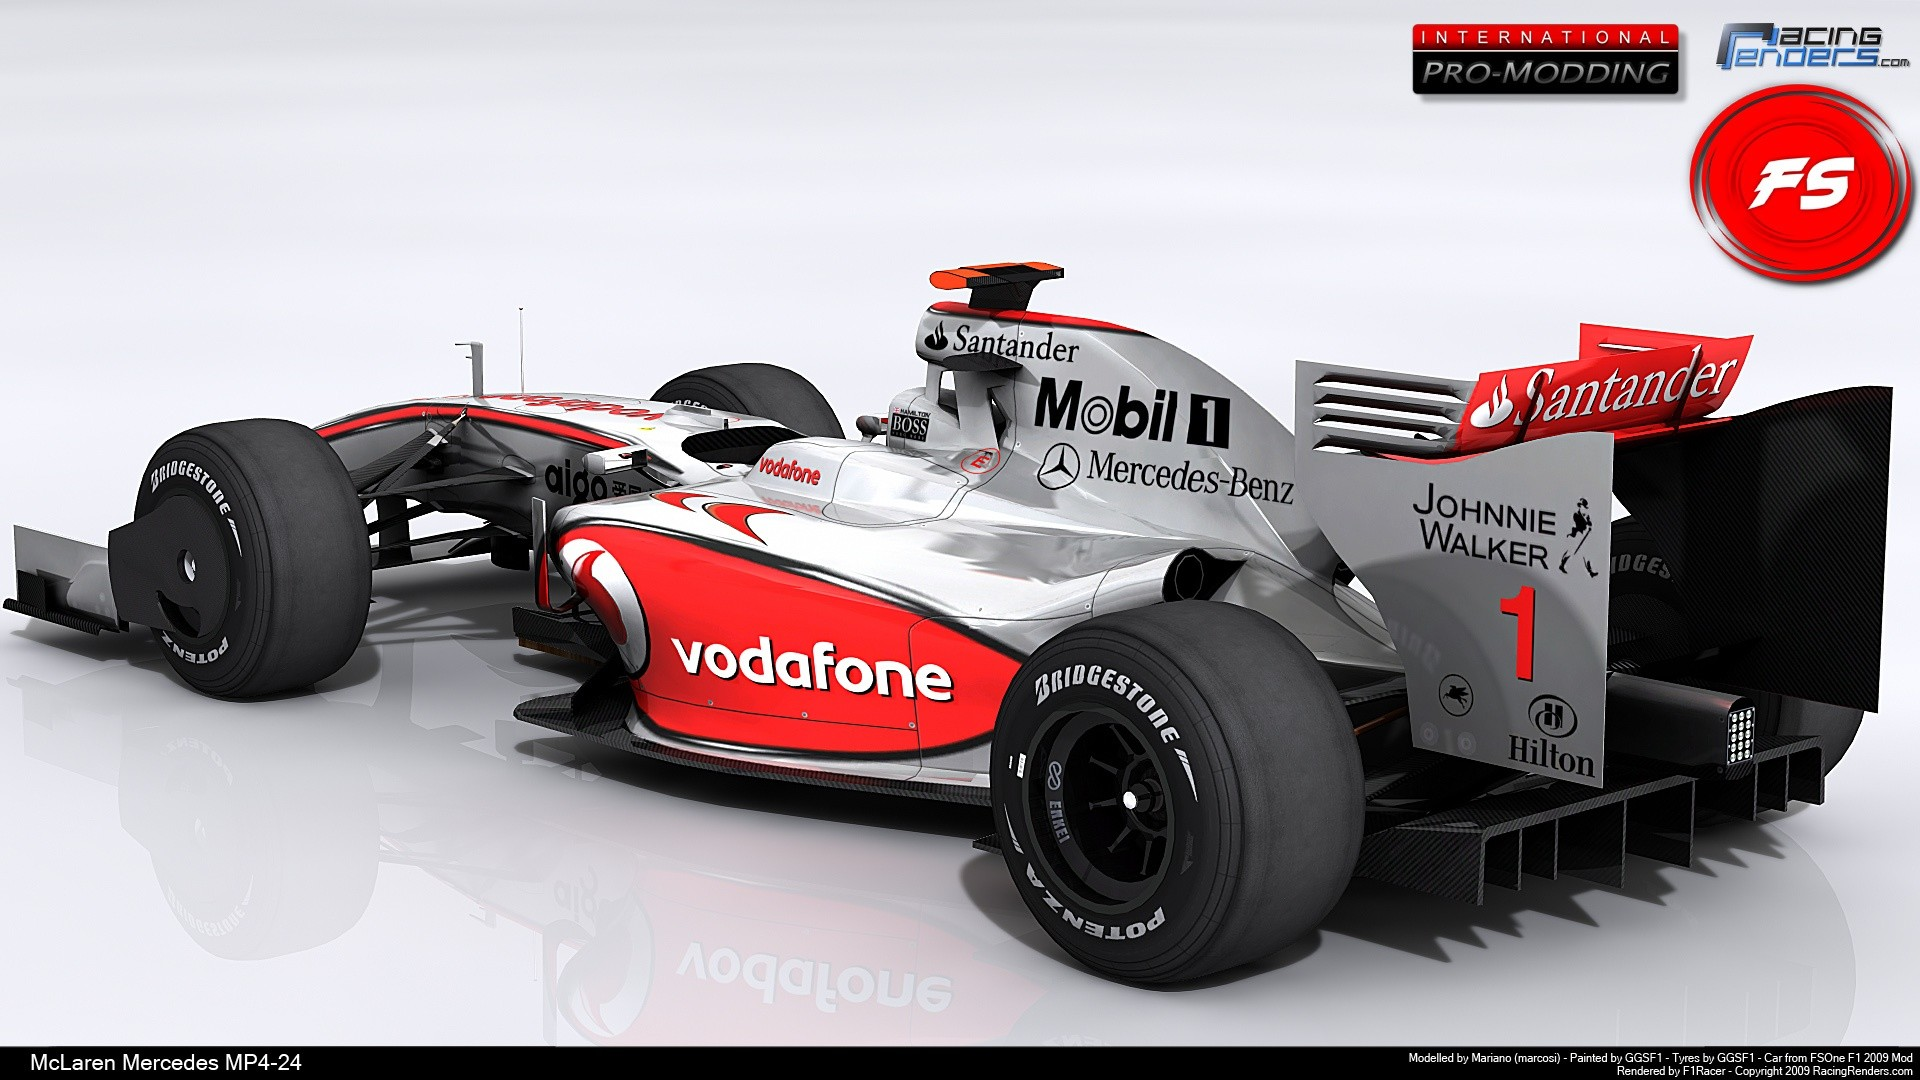 Res: 1920x1080, Mercedes Mclaren F1 Race Car